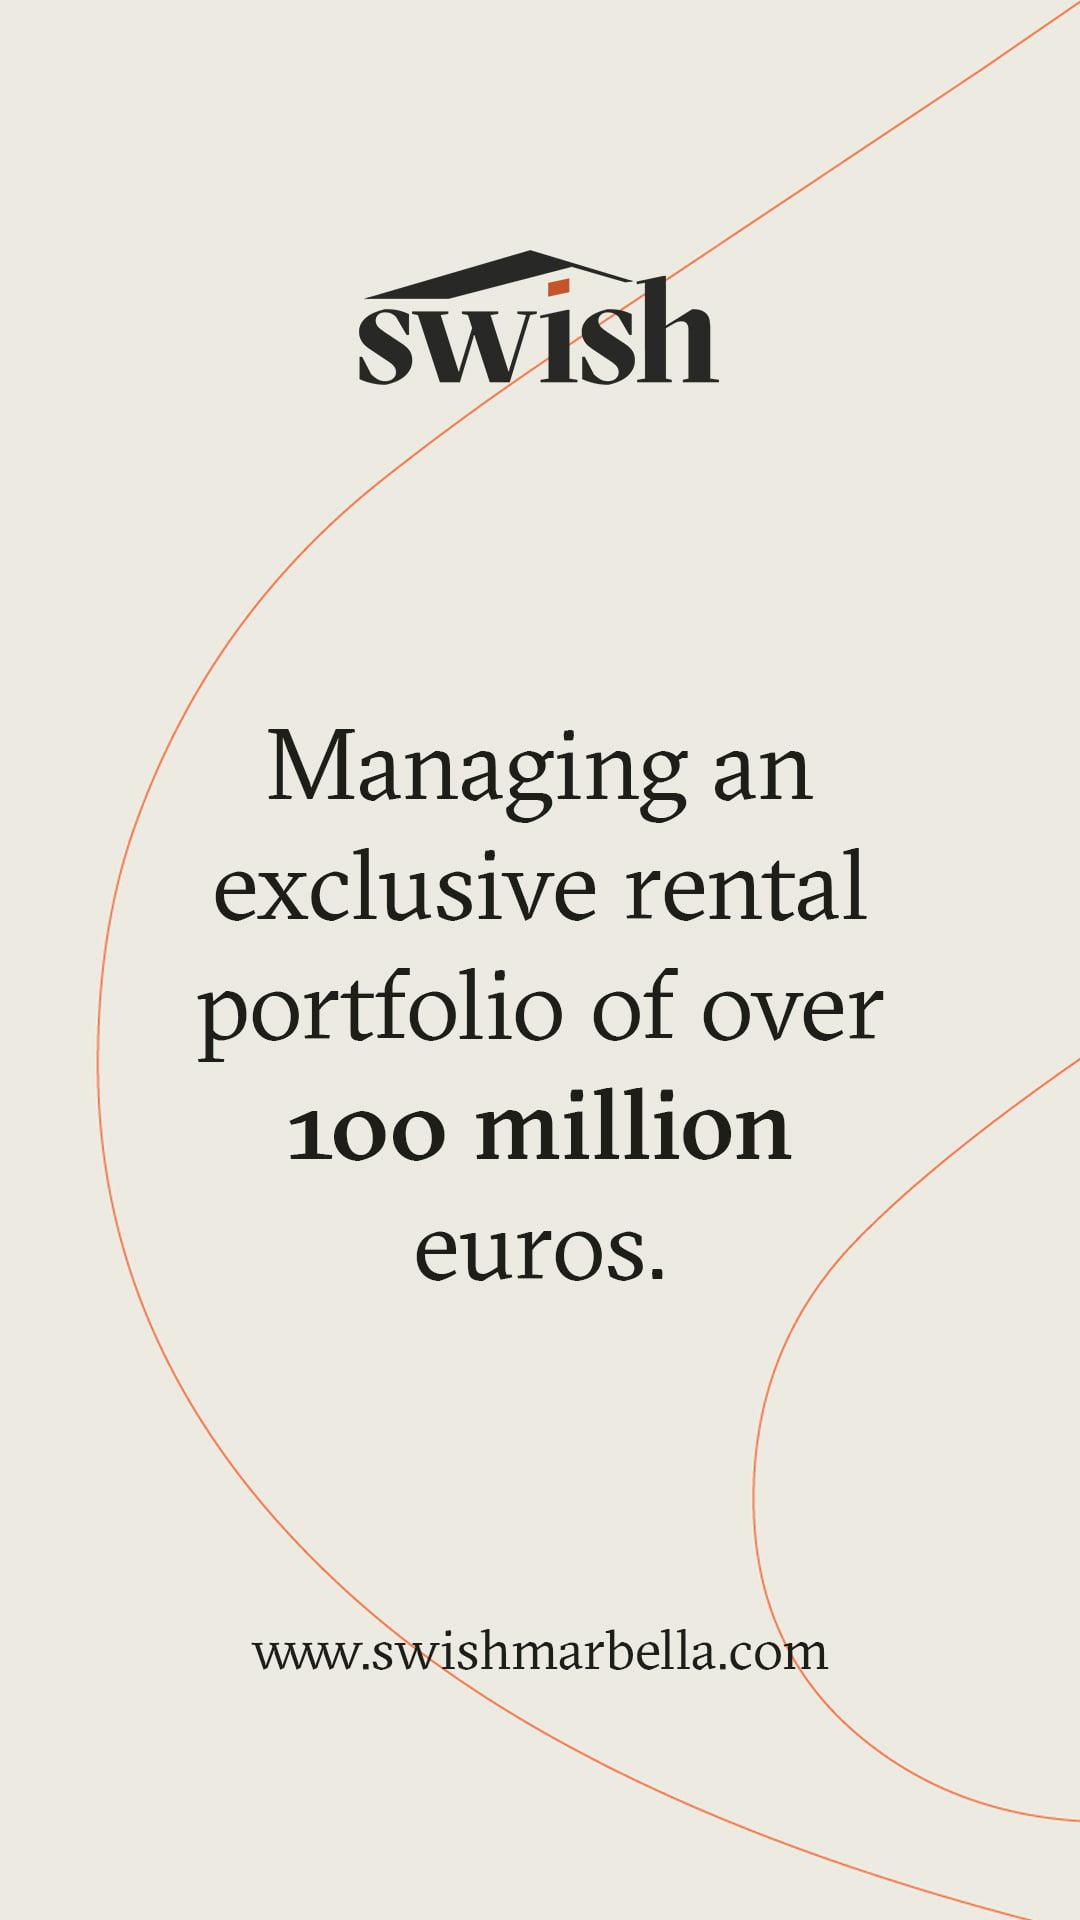 Managing an exclusive rental porfolio - Instagram Story post